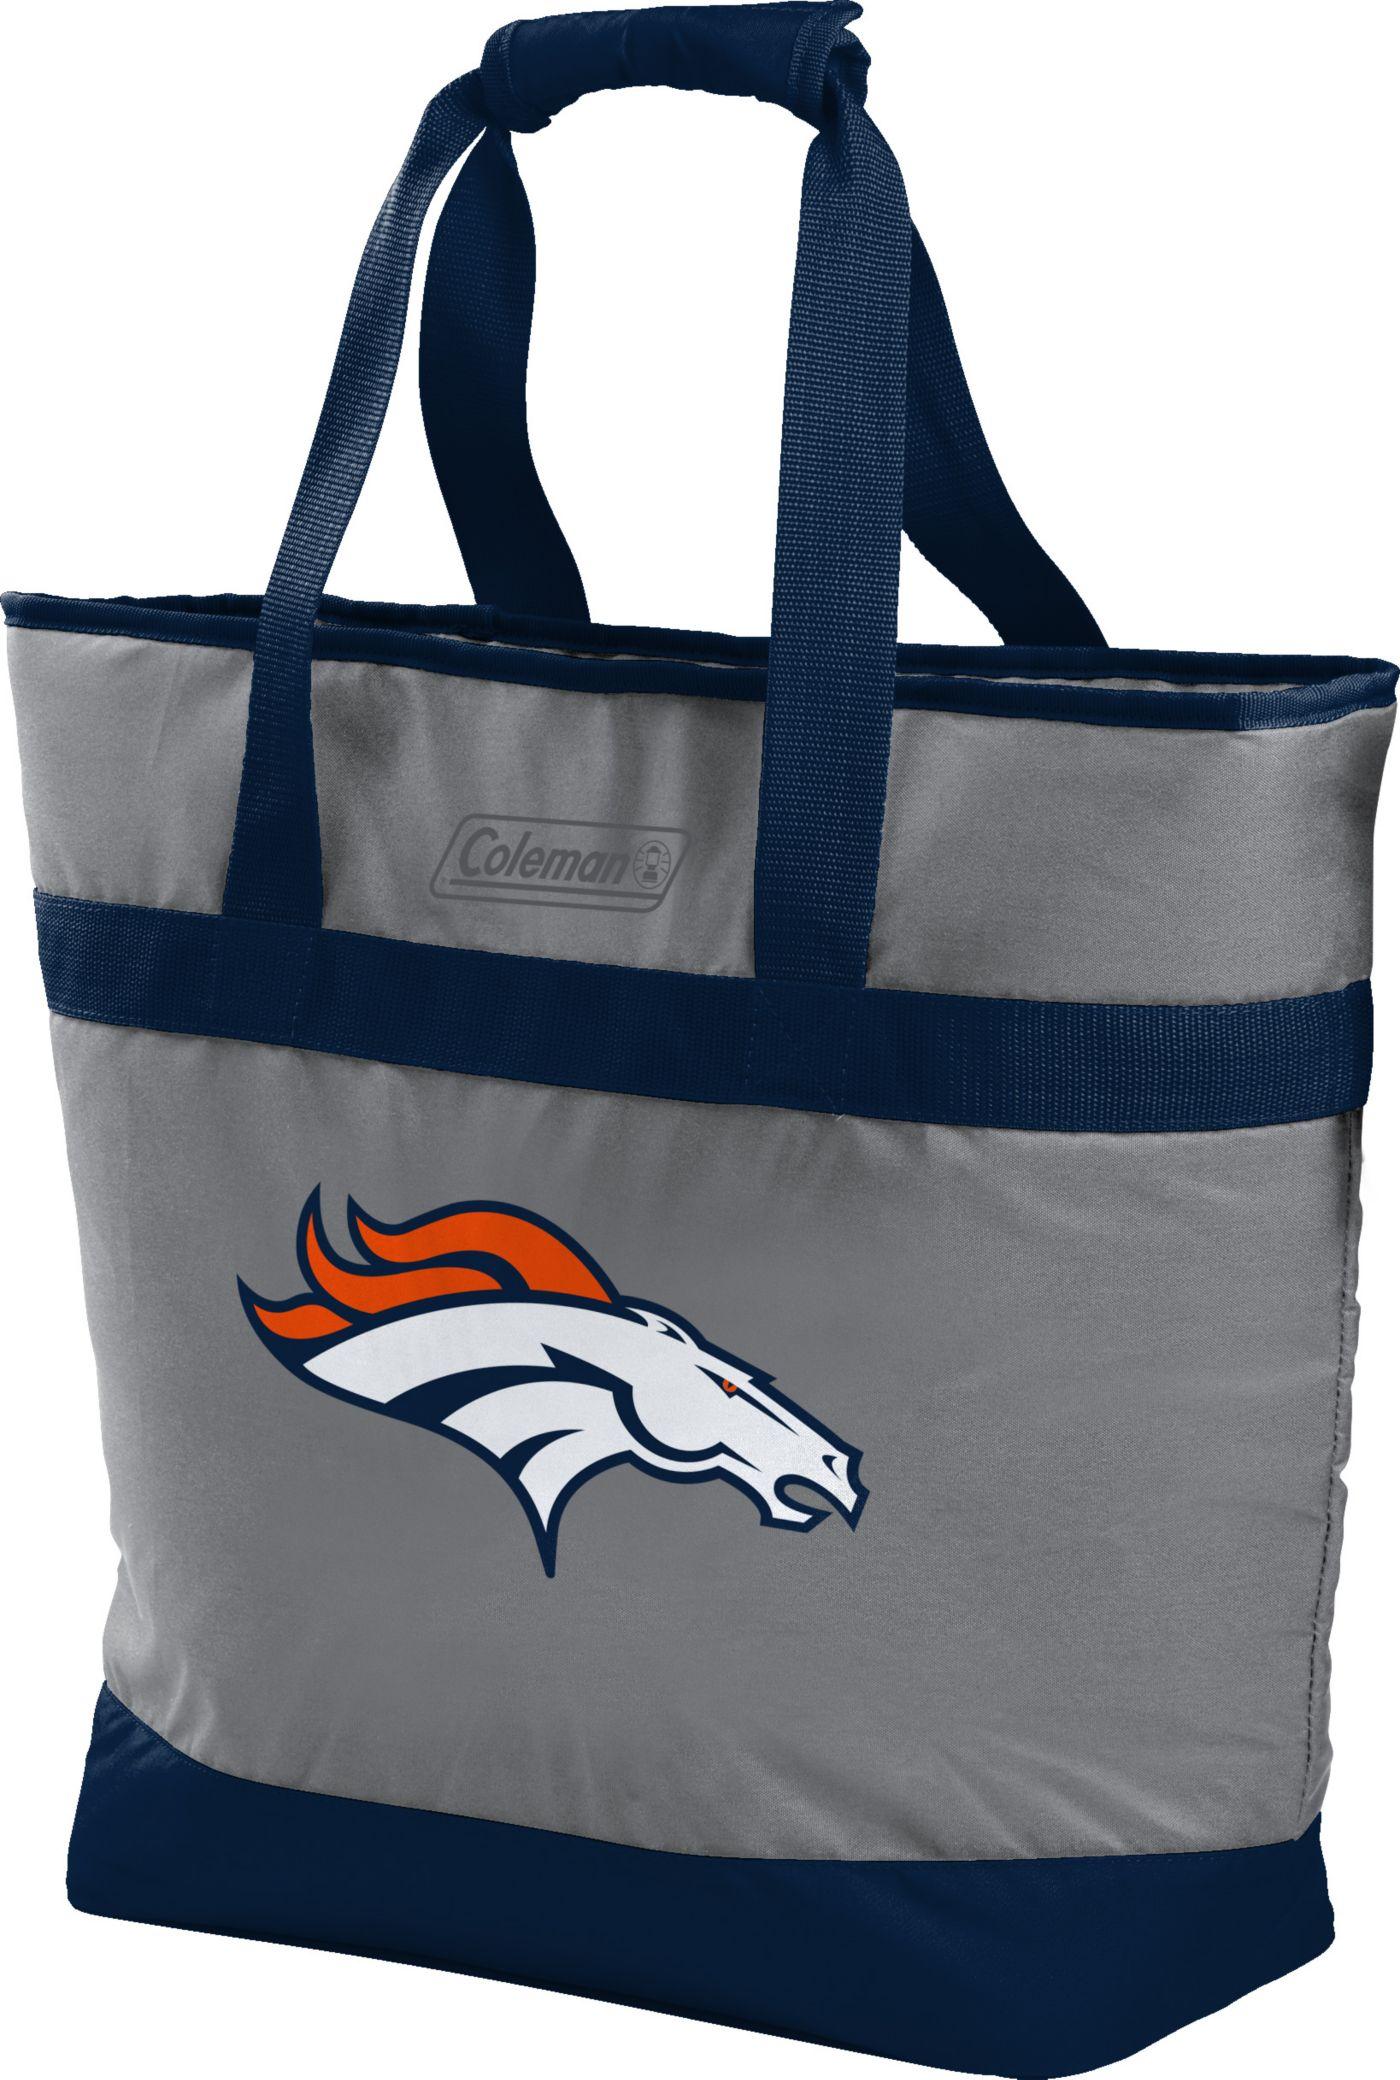 Rawlings Denver Broncos Large Tote Cooler